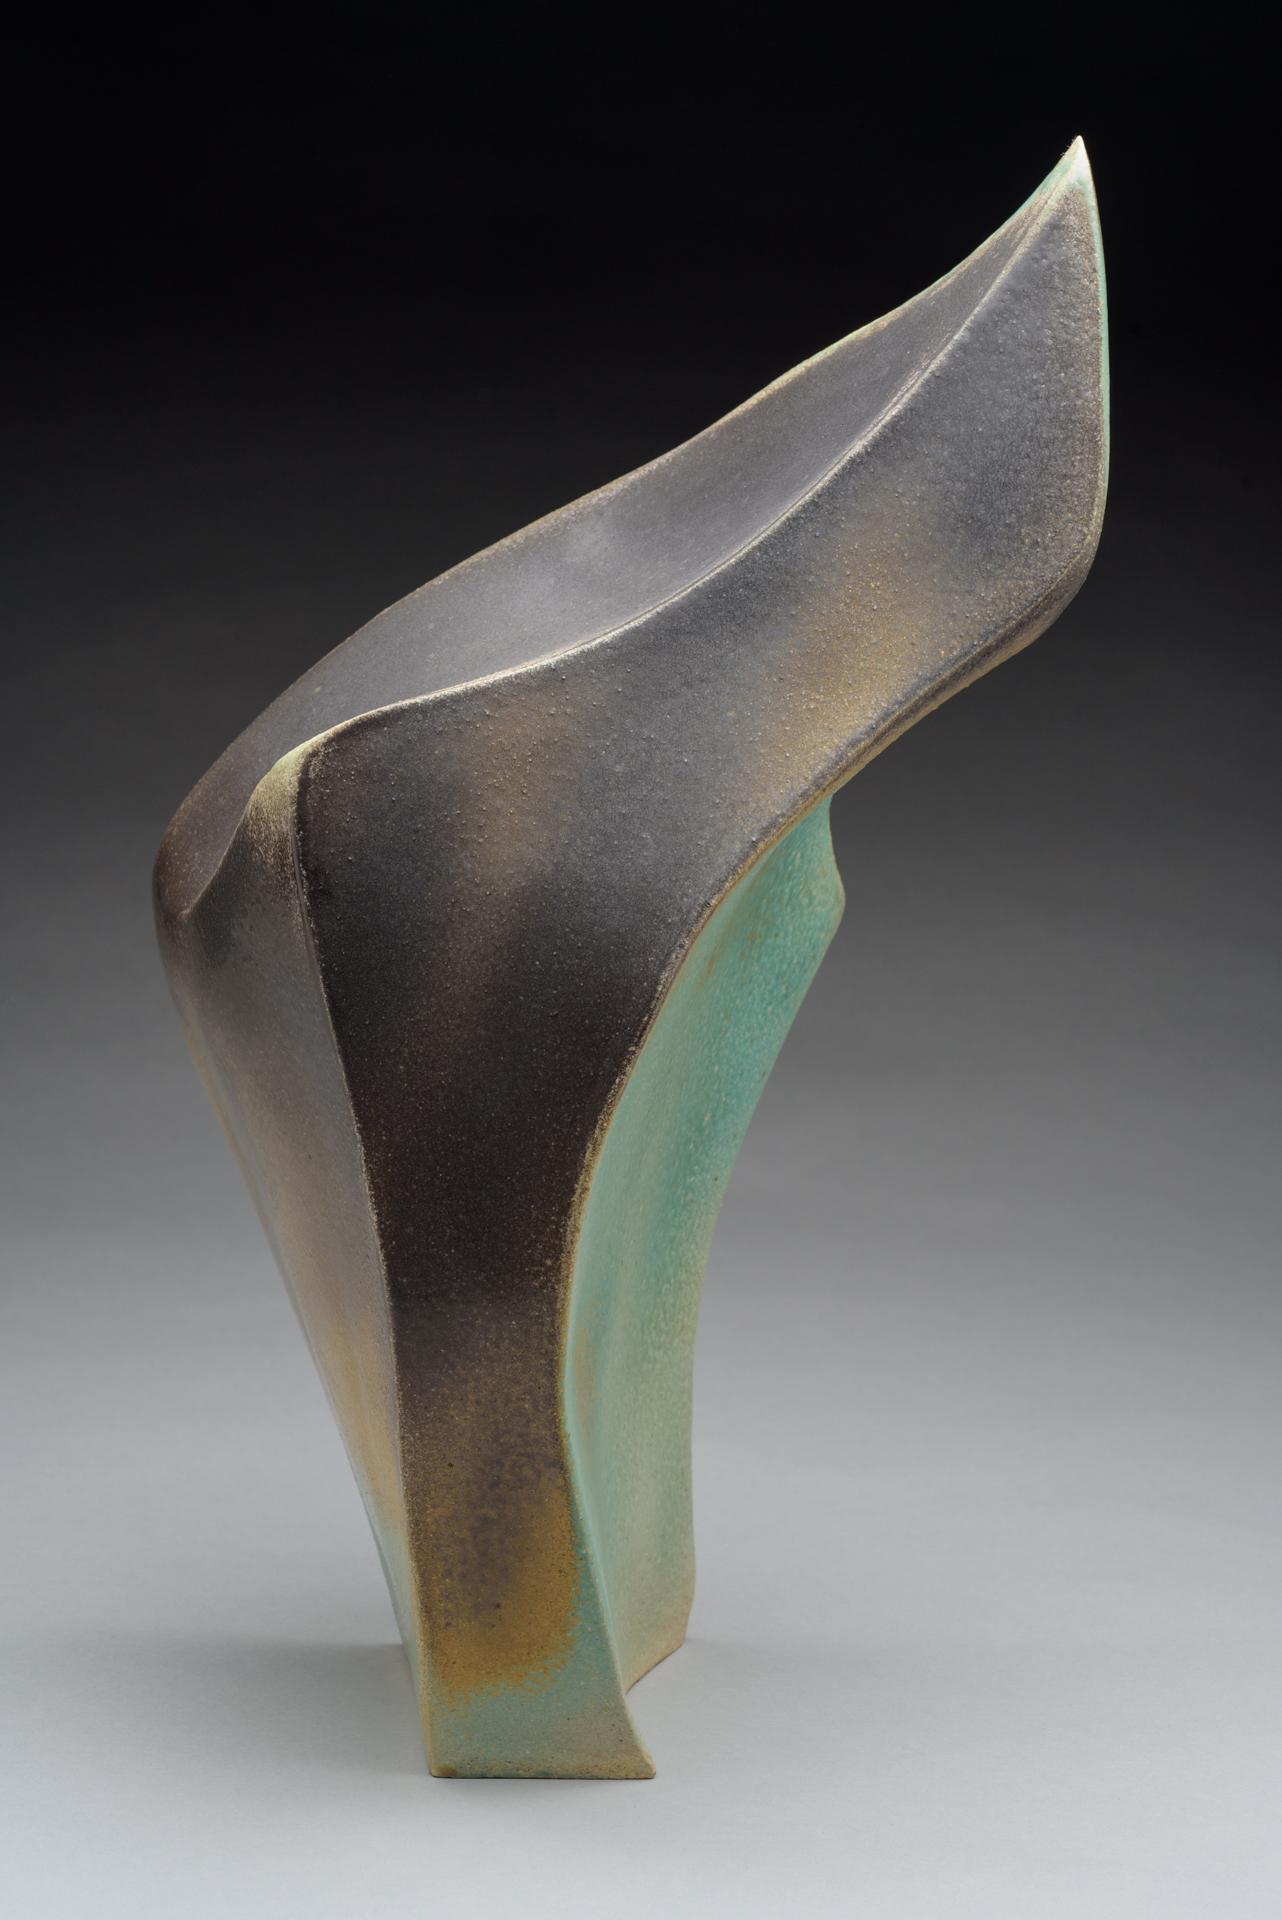 "Carbon Flame . Ceramic. Handbuilt from stoneware clay, sprayed glaze, salt/soda fired to cone 10 in Noborigama wood kiln. 19"" h x 8"" w x 9"" d. 2016."